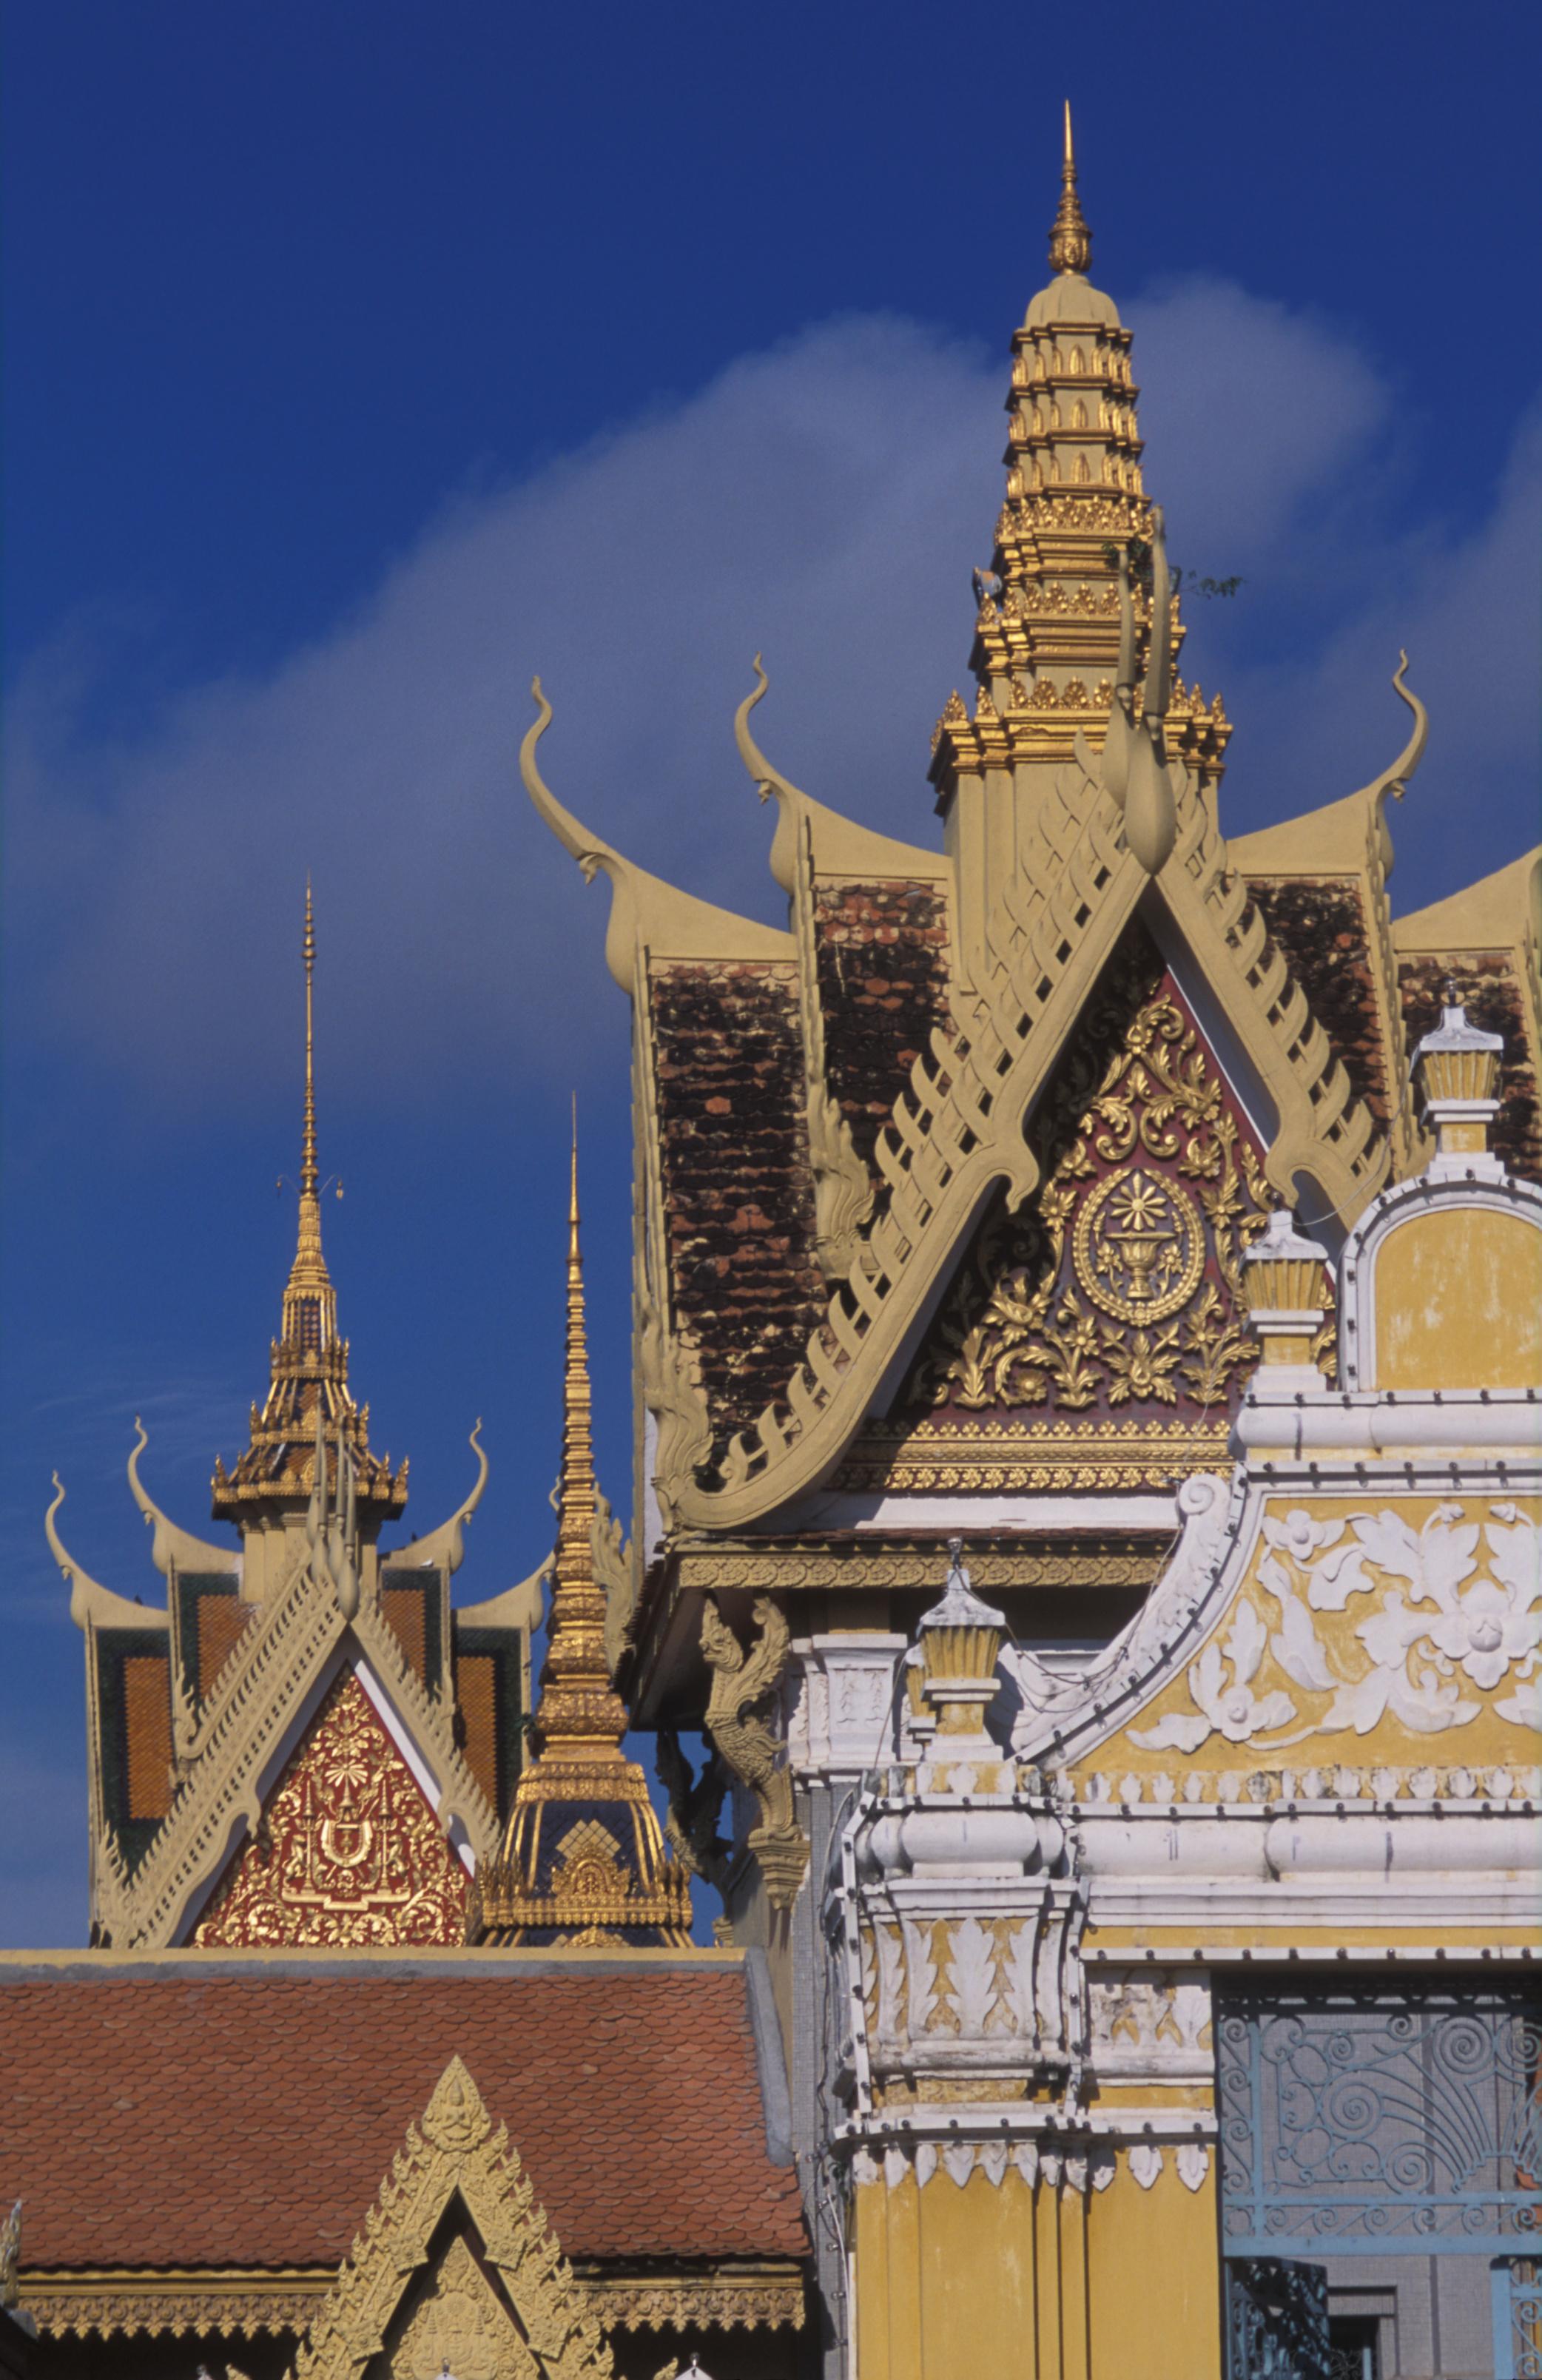 Kingdon Palace in Phnomphen